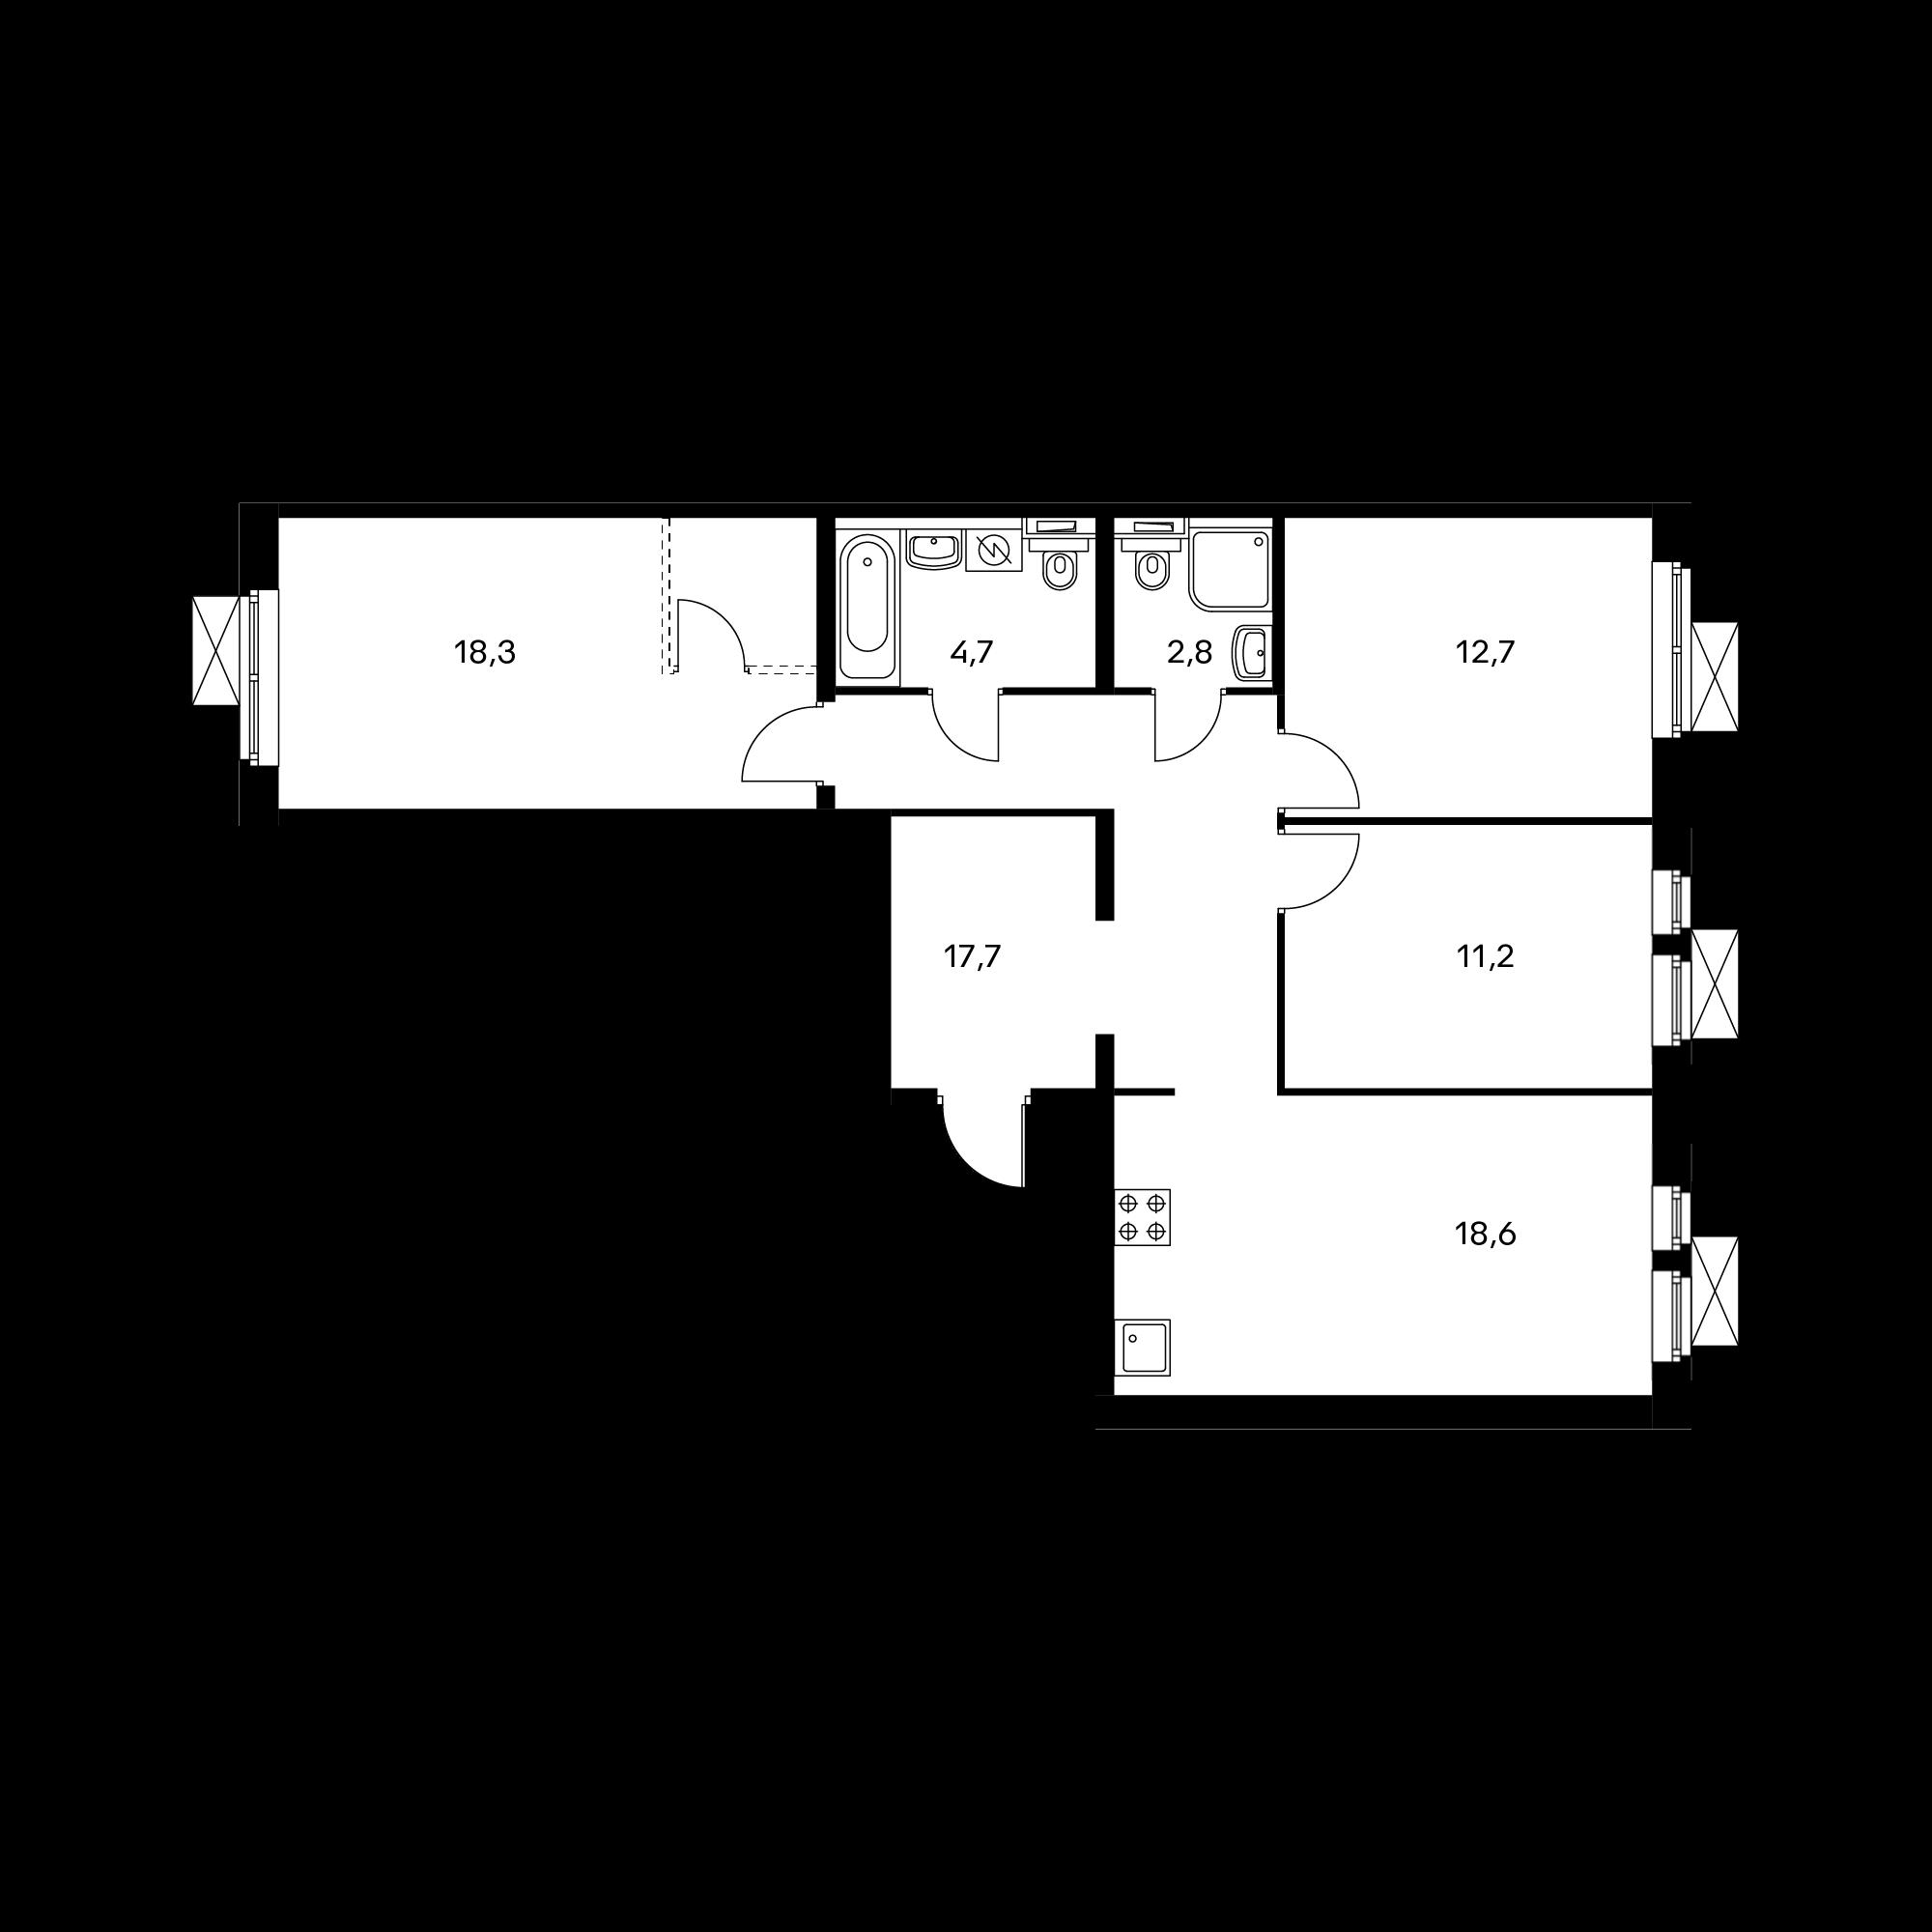 3EL3_9.6-2